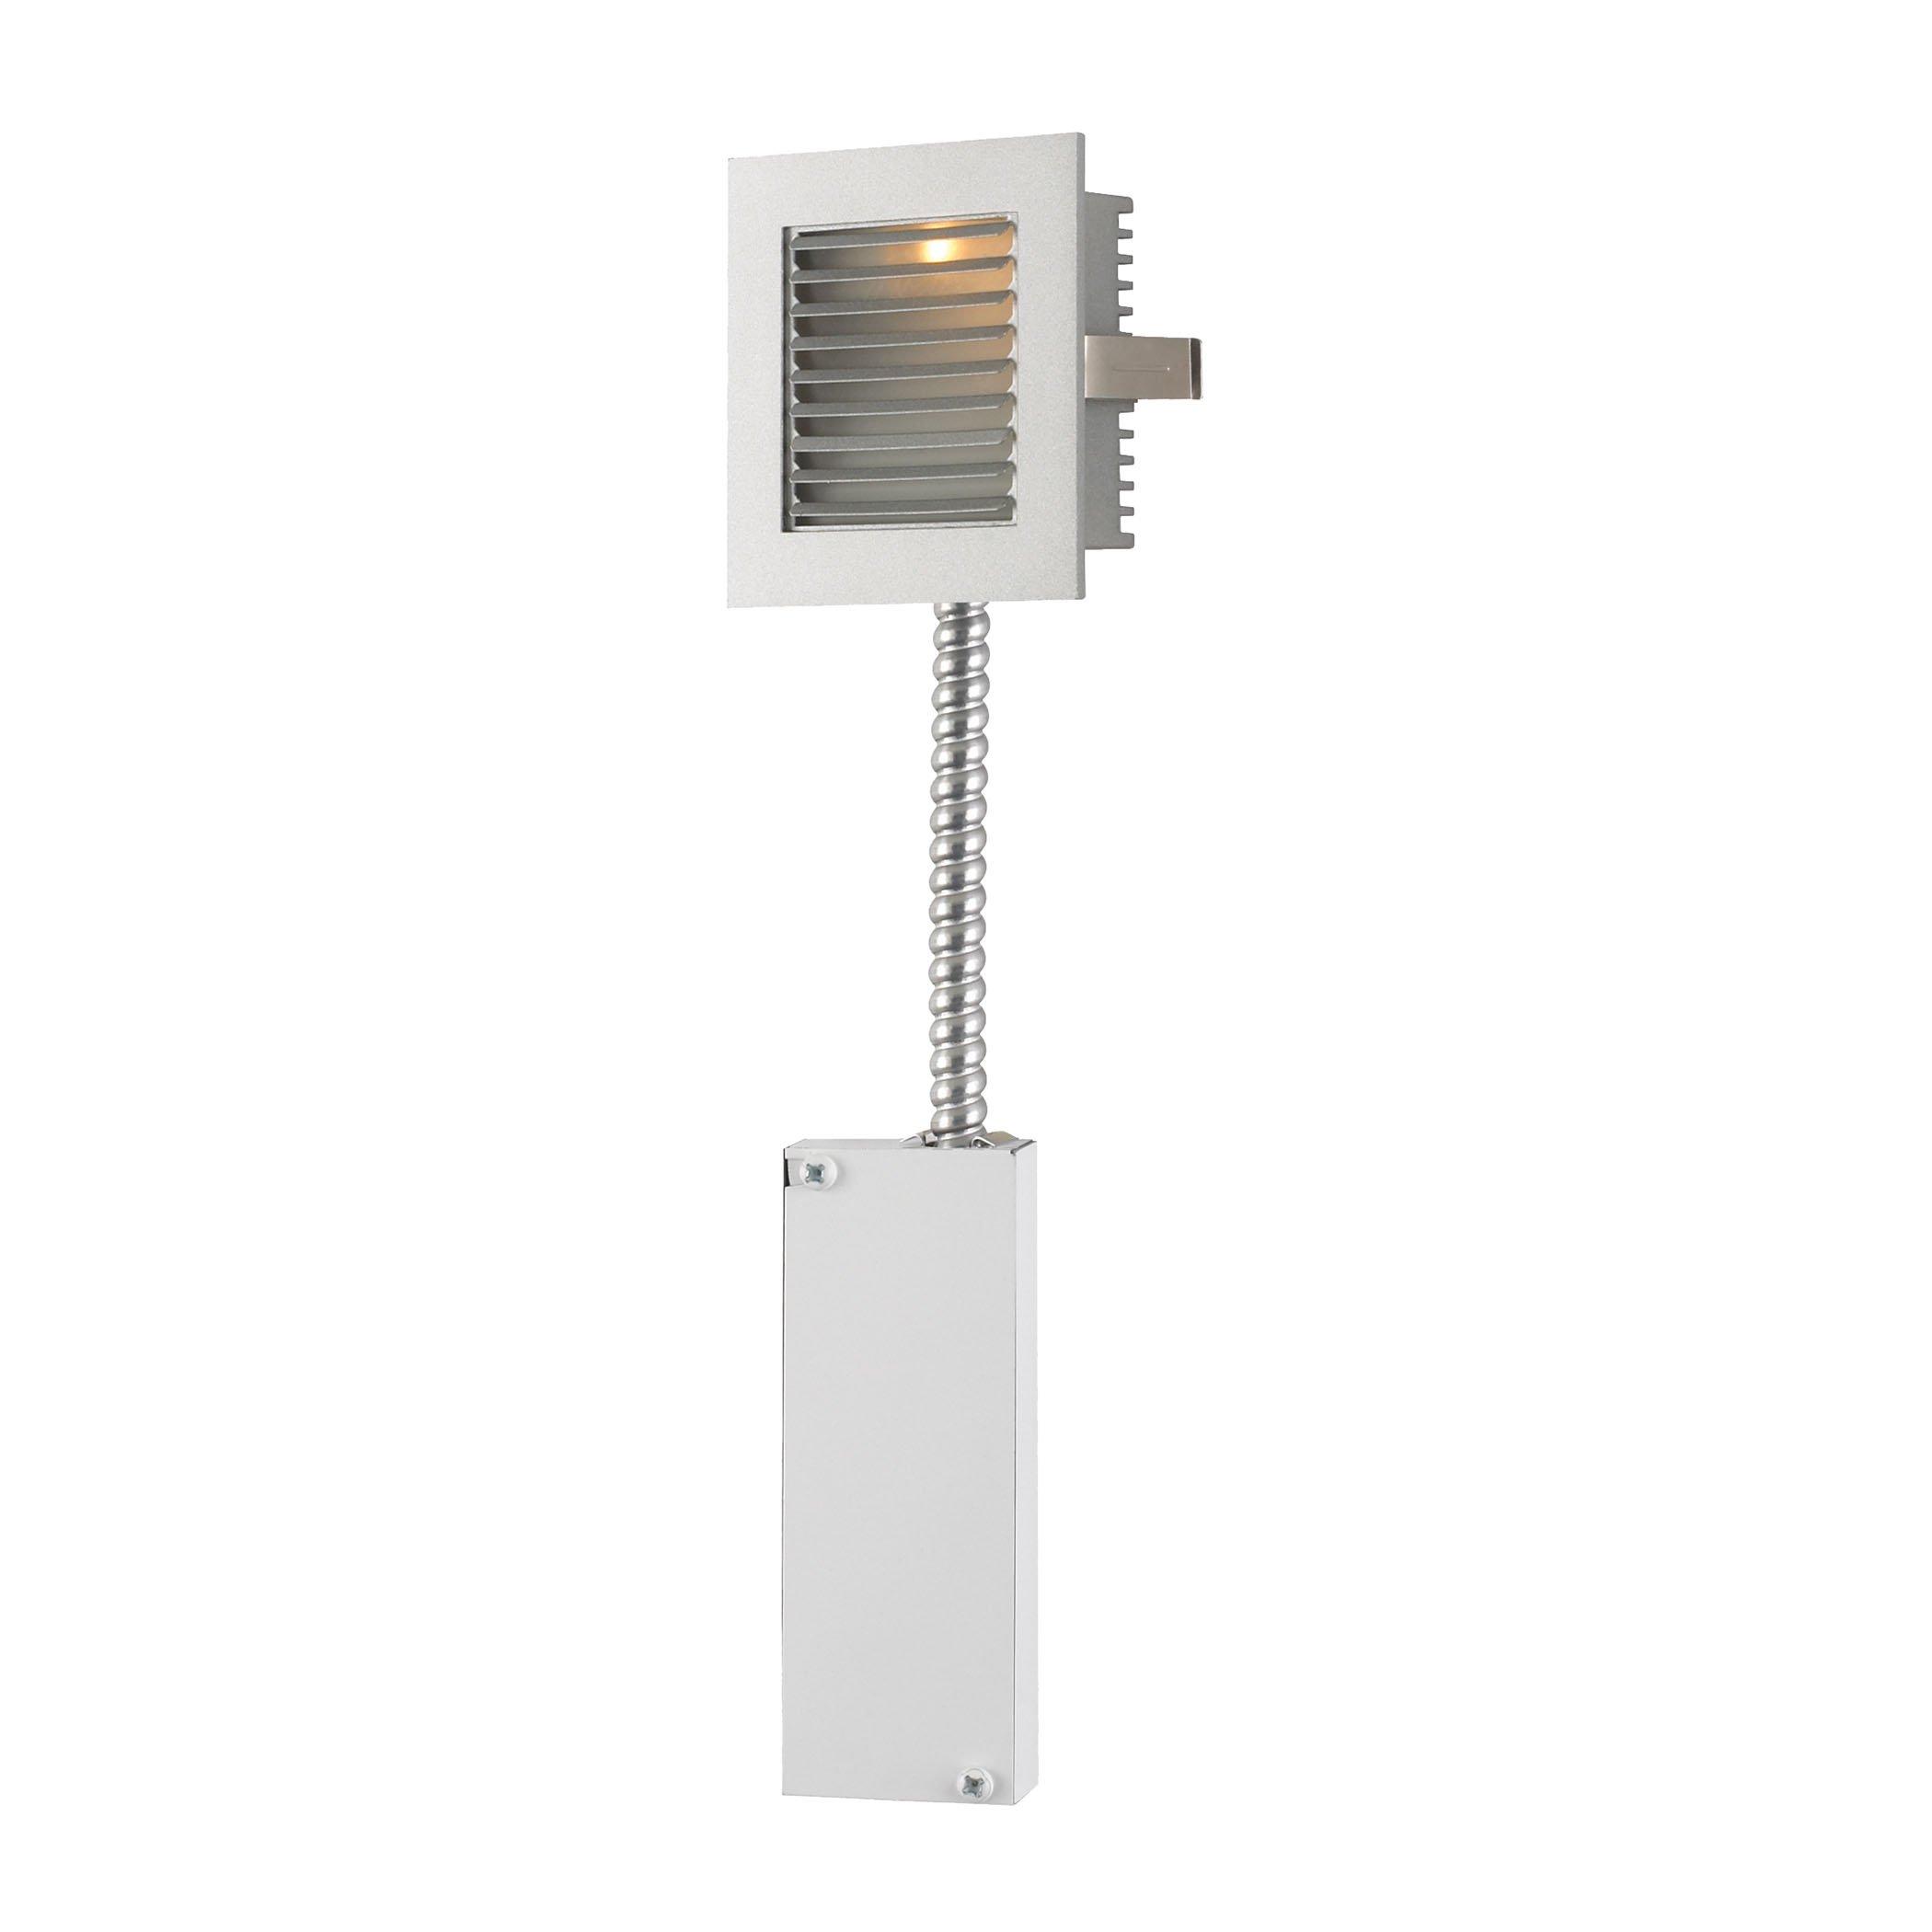 Steplight - Wall Recessed Xenon W/ Retrofit Housing Grey Louvre / Grey Trim